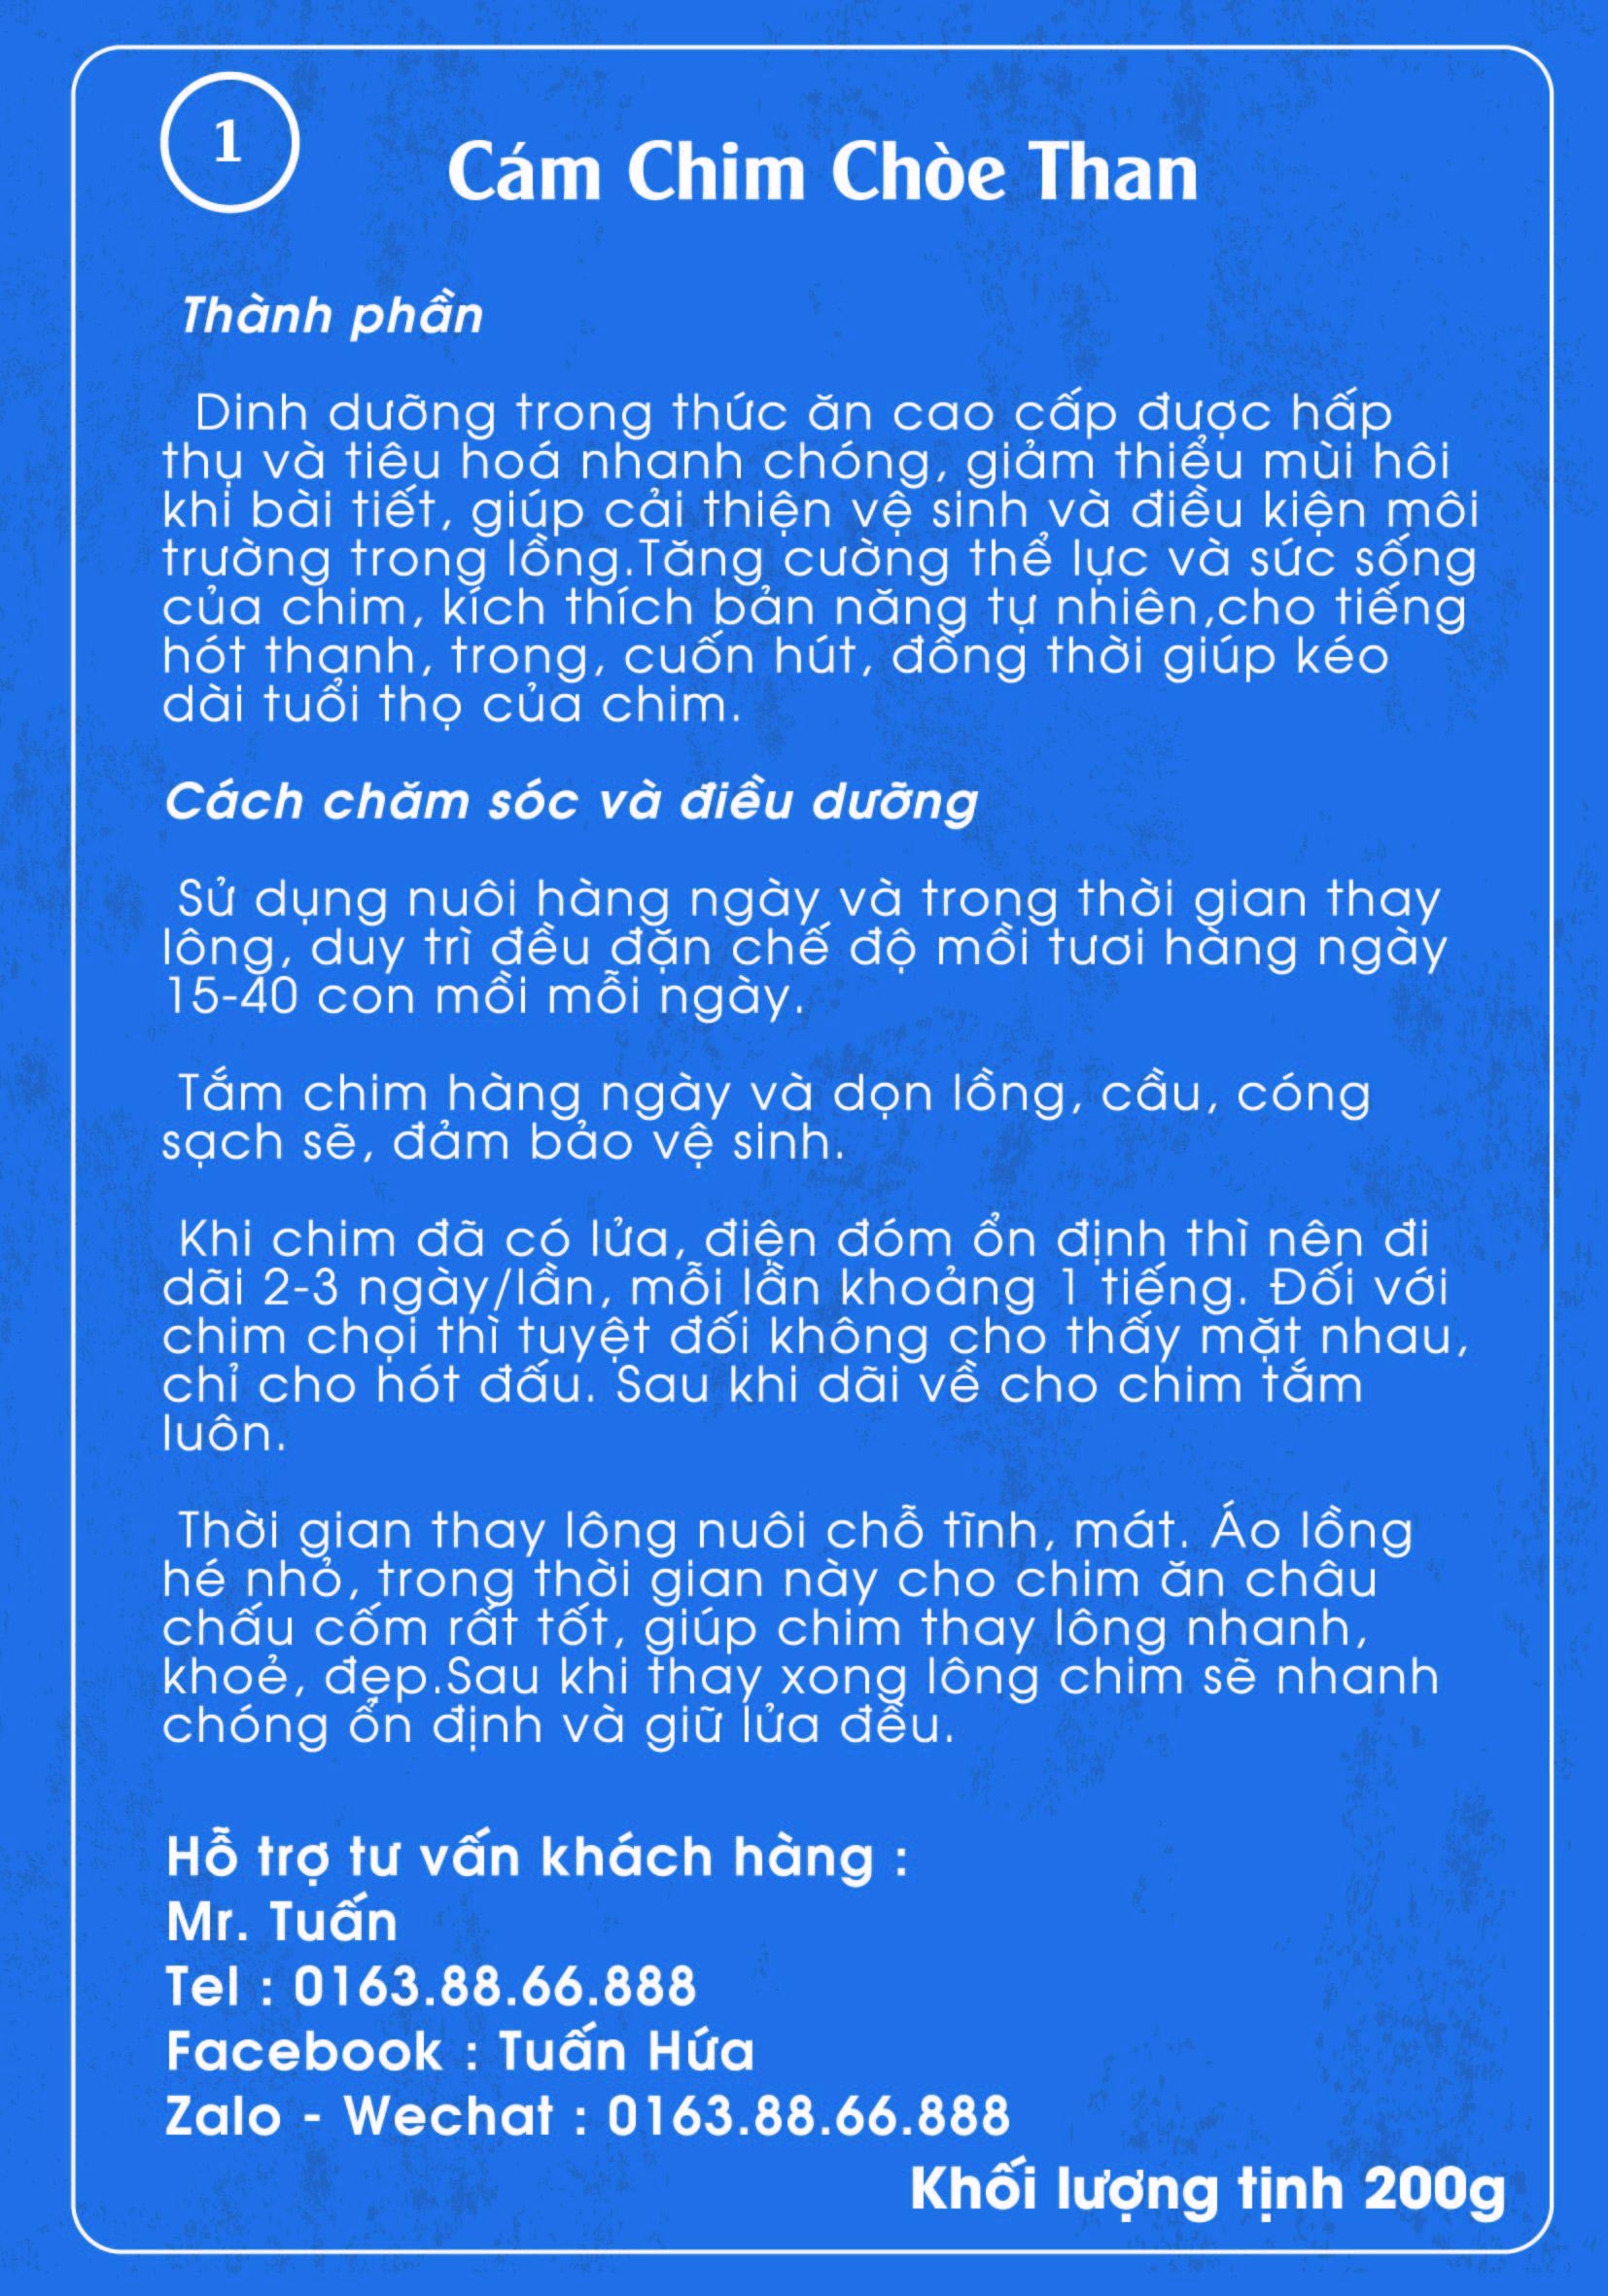 CHIM CHÒE THAN 1 MẶT SAU 01